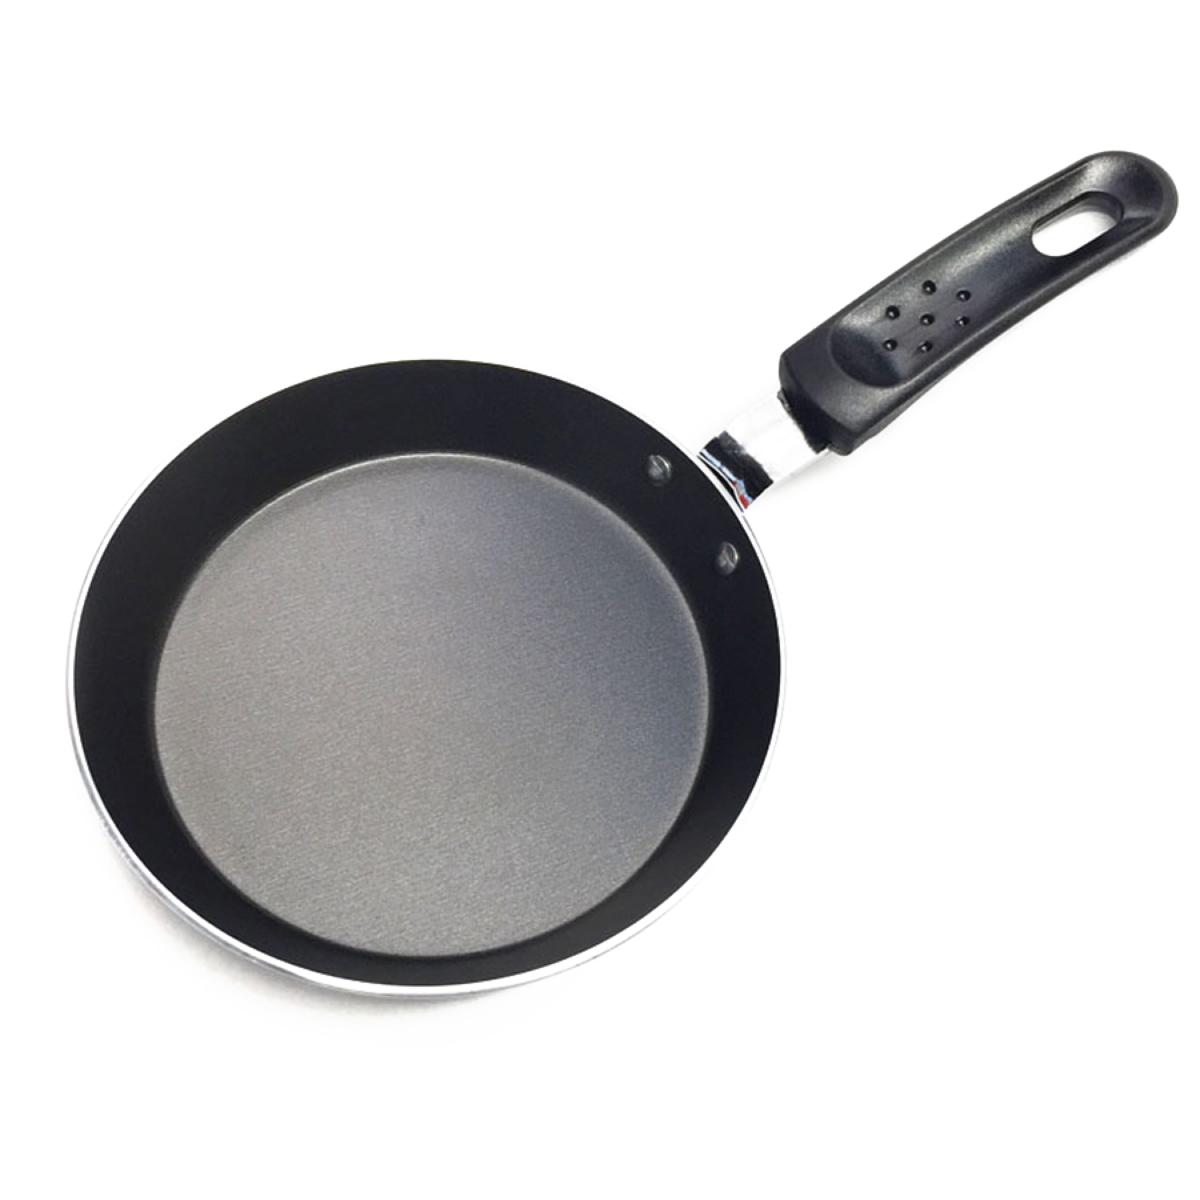 Robert Dyas 15cm Mini Frying Pan